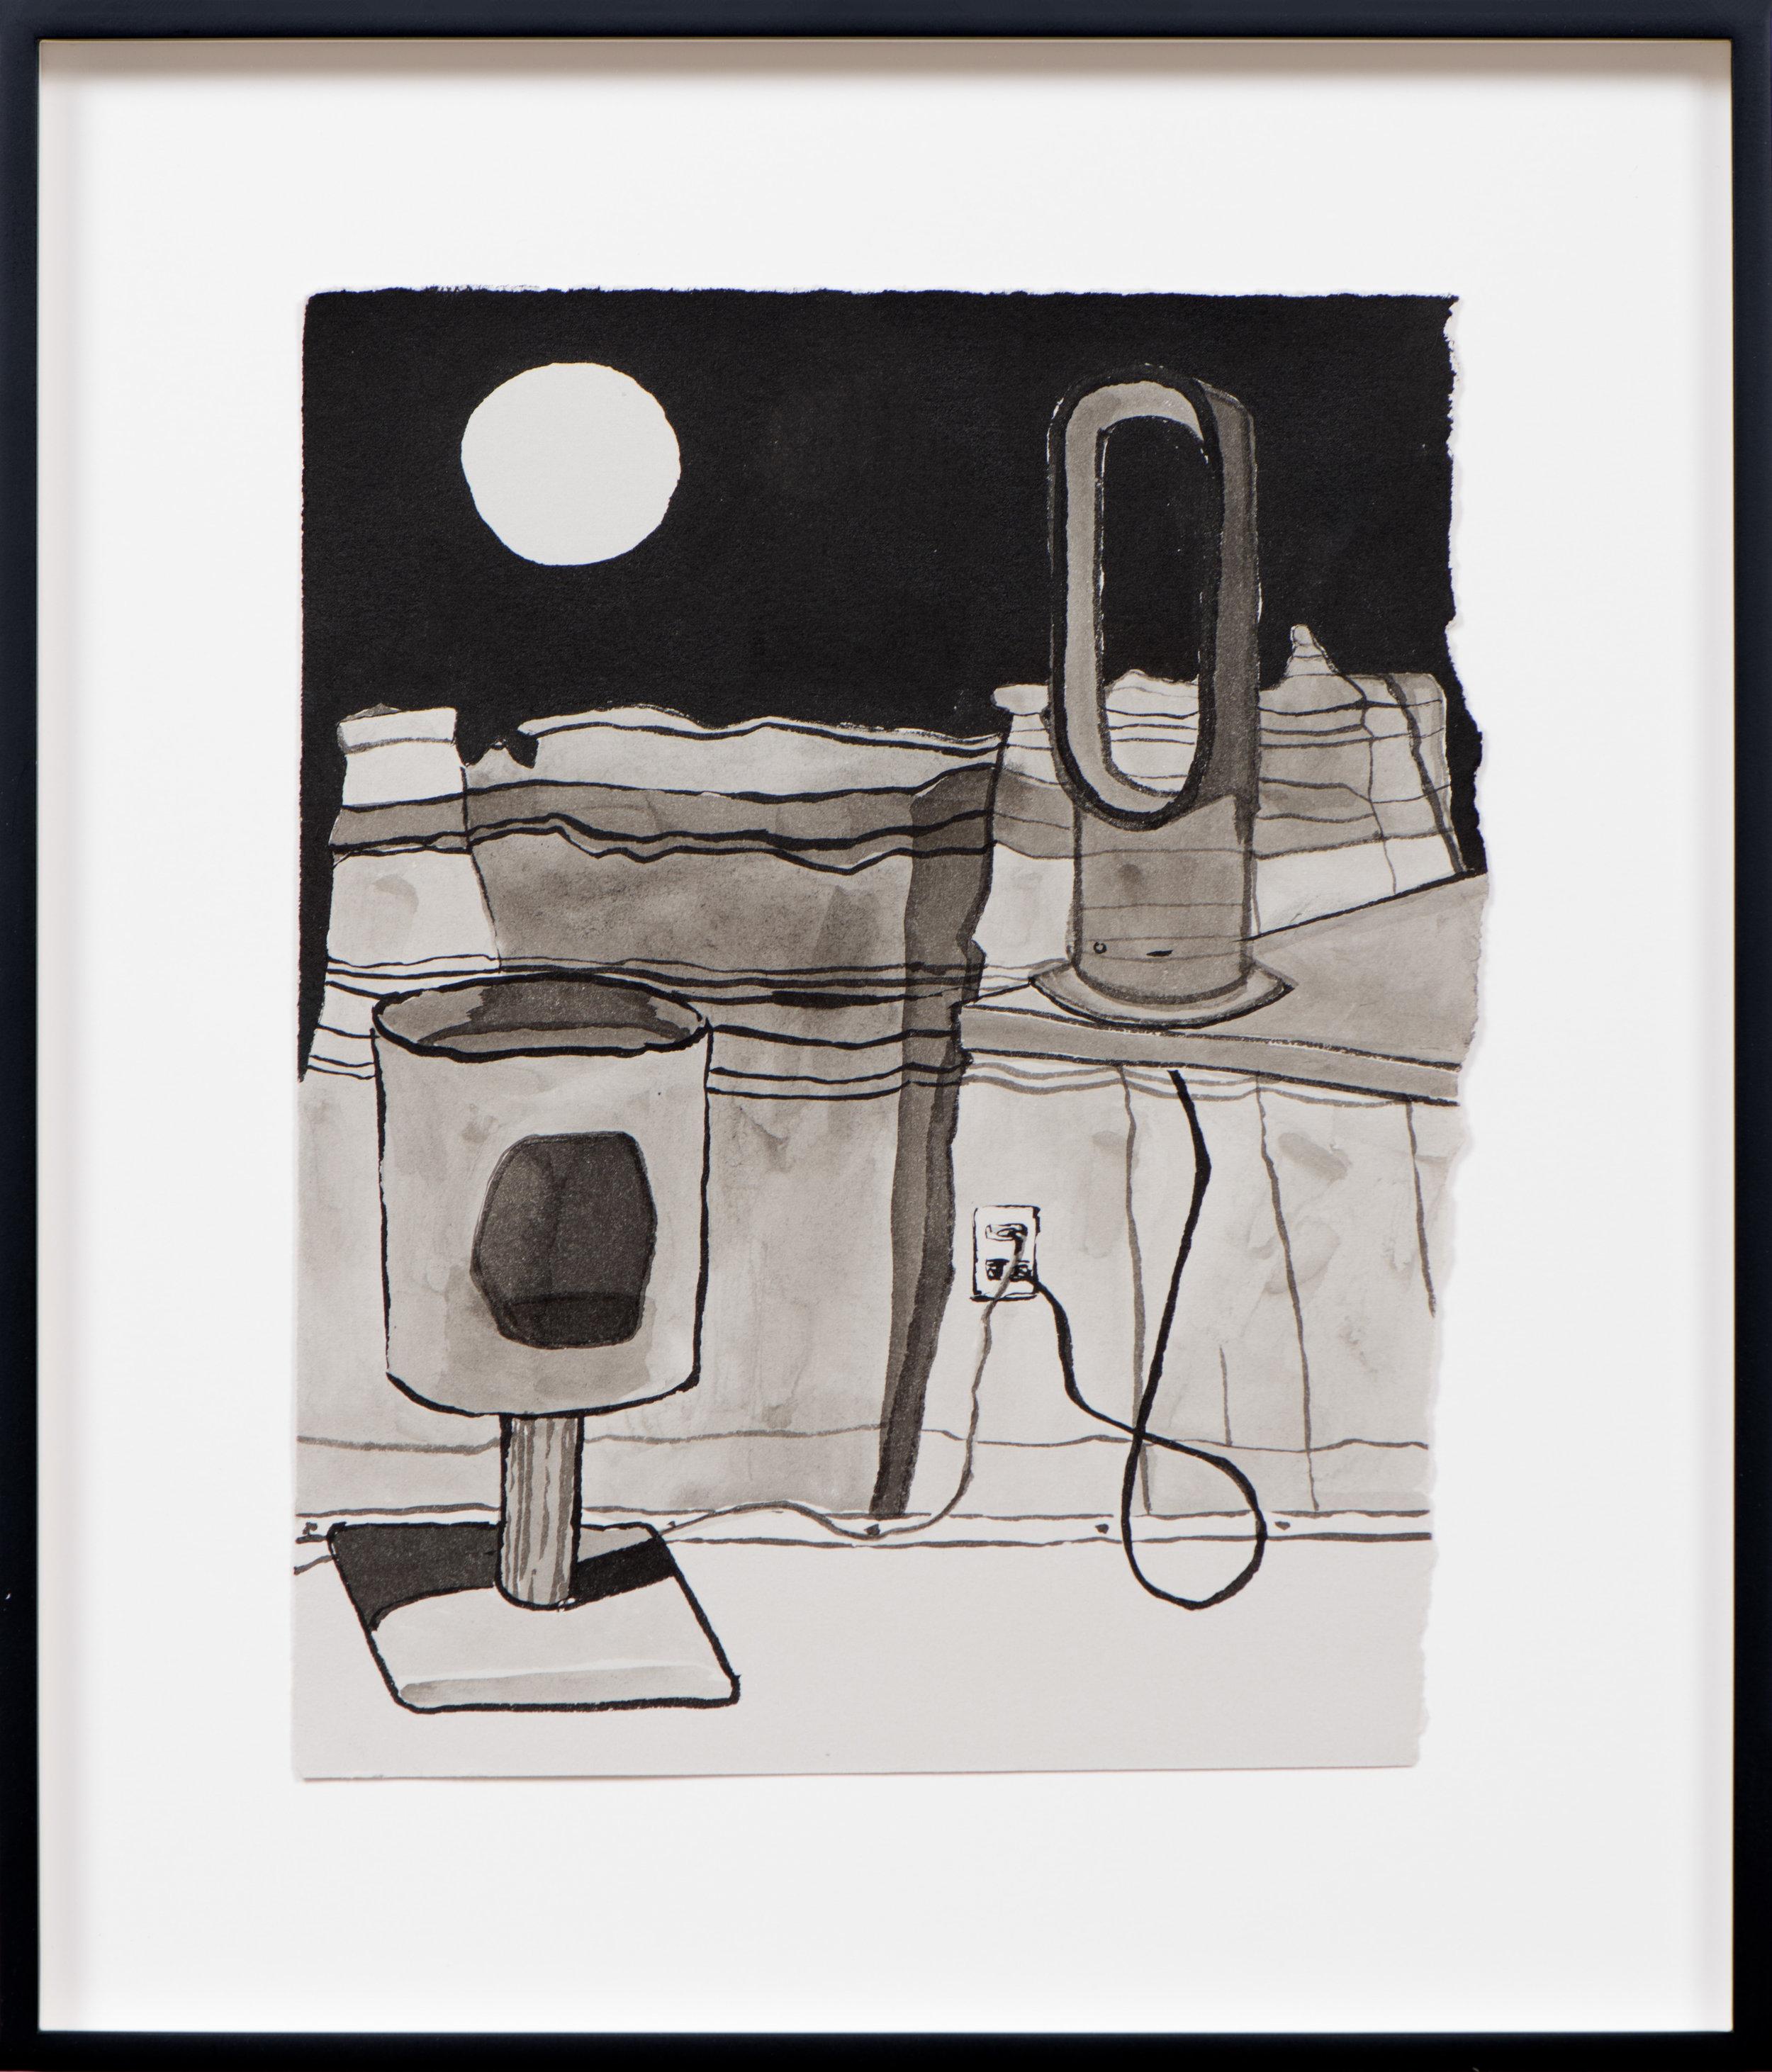 Gabrielle Ferrer  Cat Scratcher , 2019 Ink on paper 15 1/2 x 13 1/2 inches